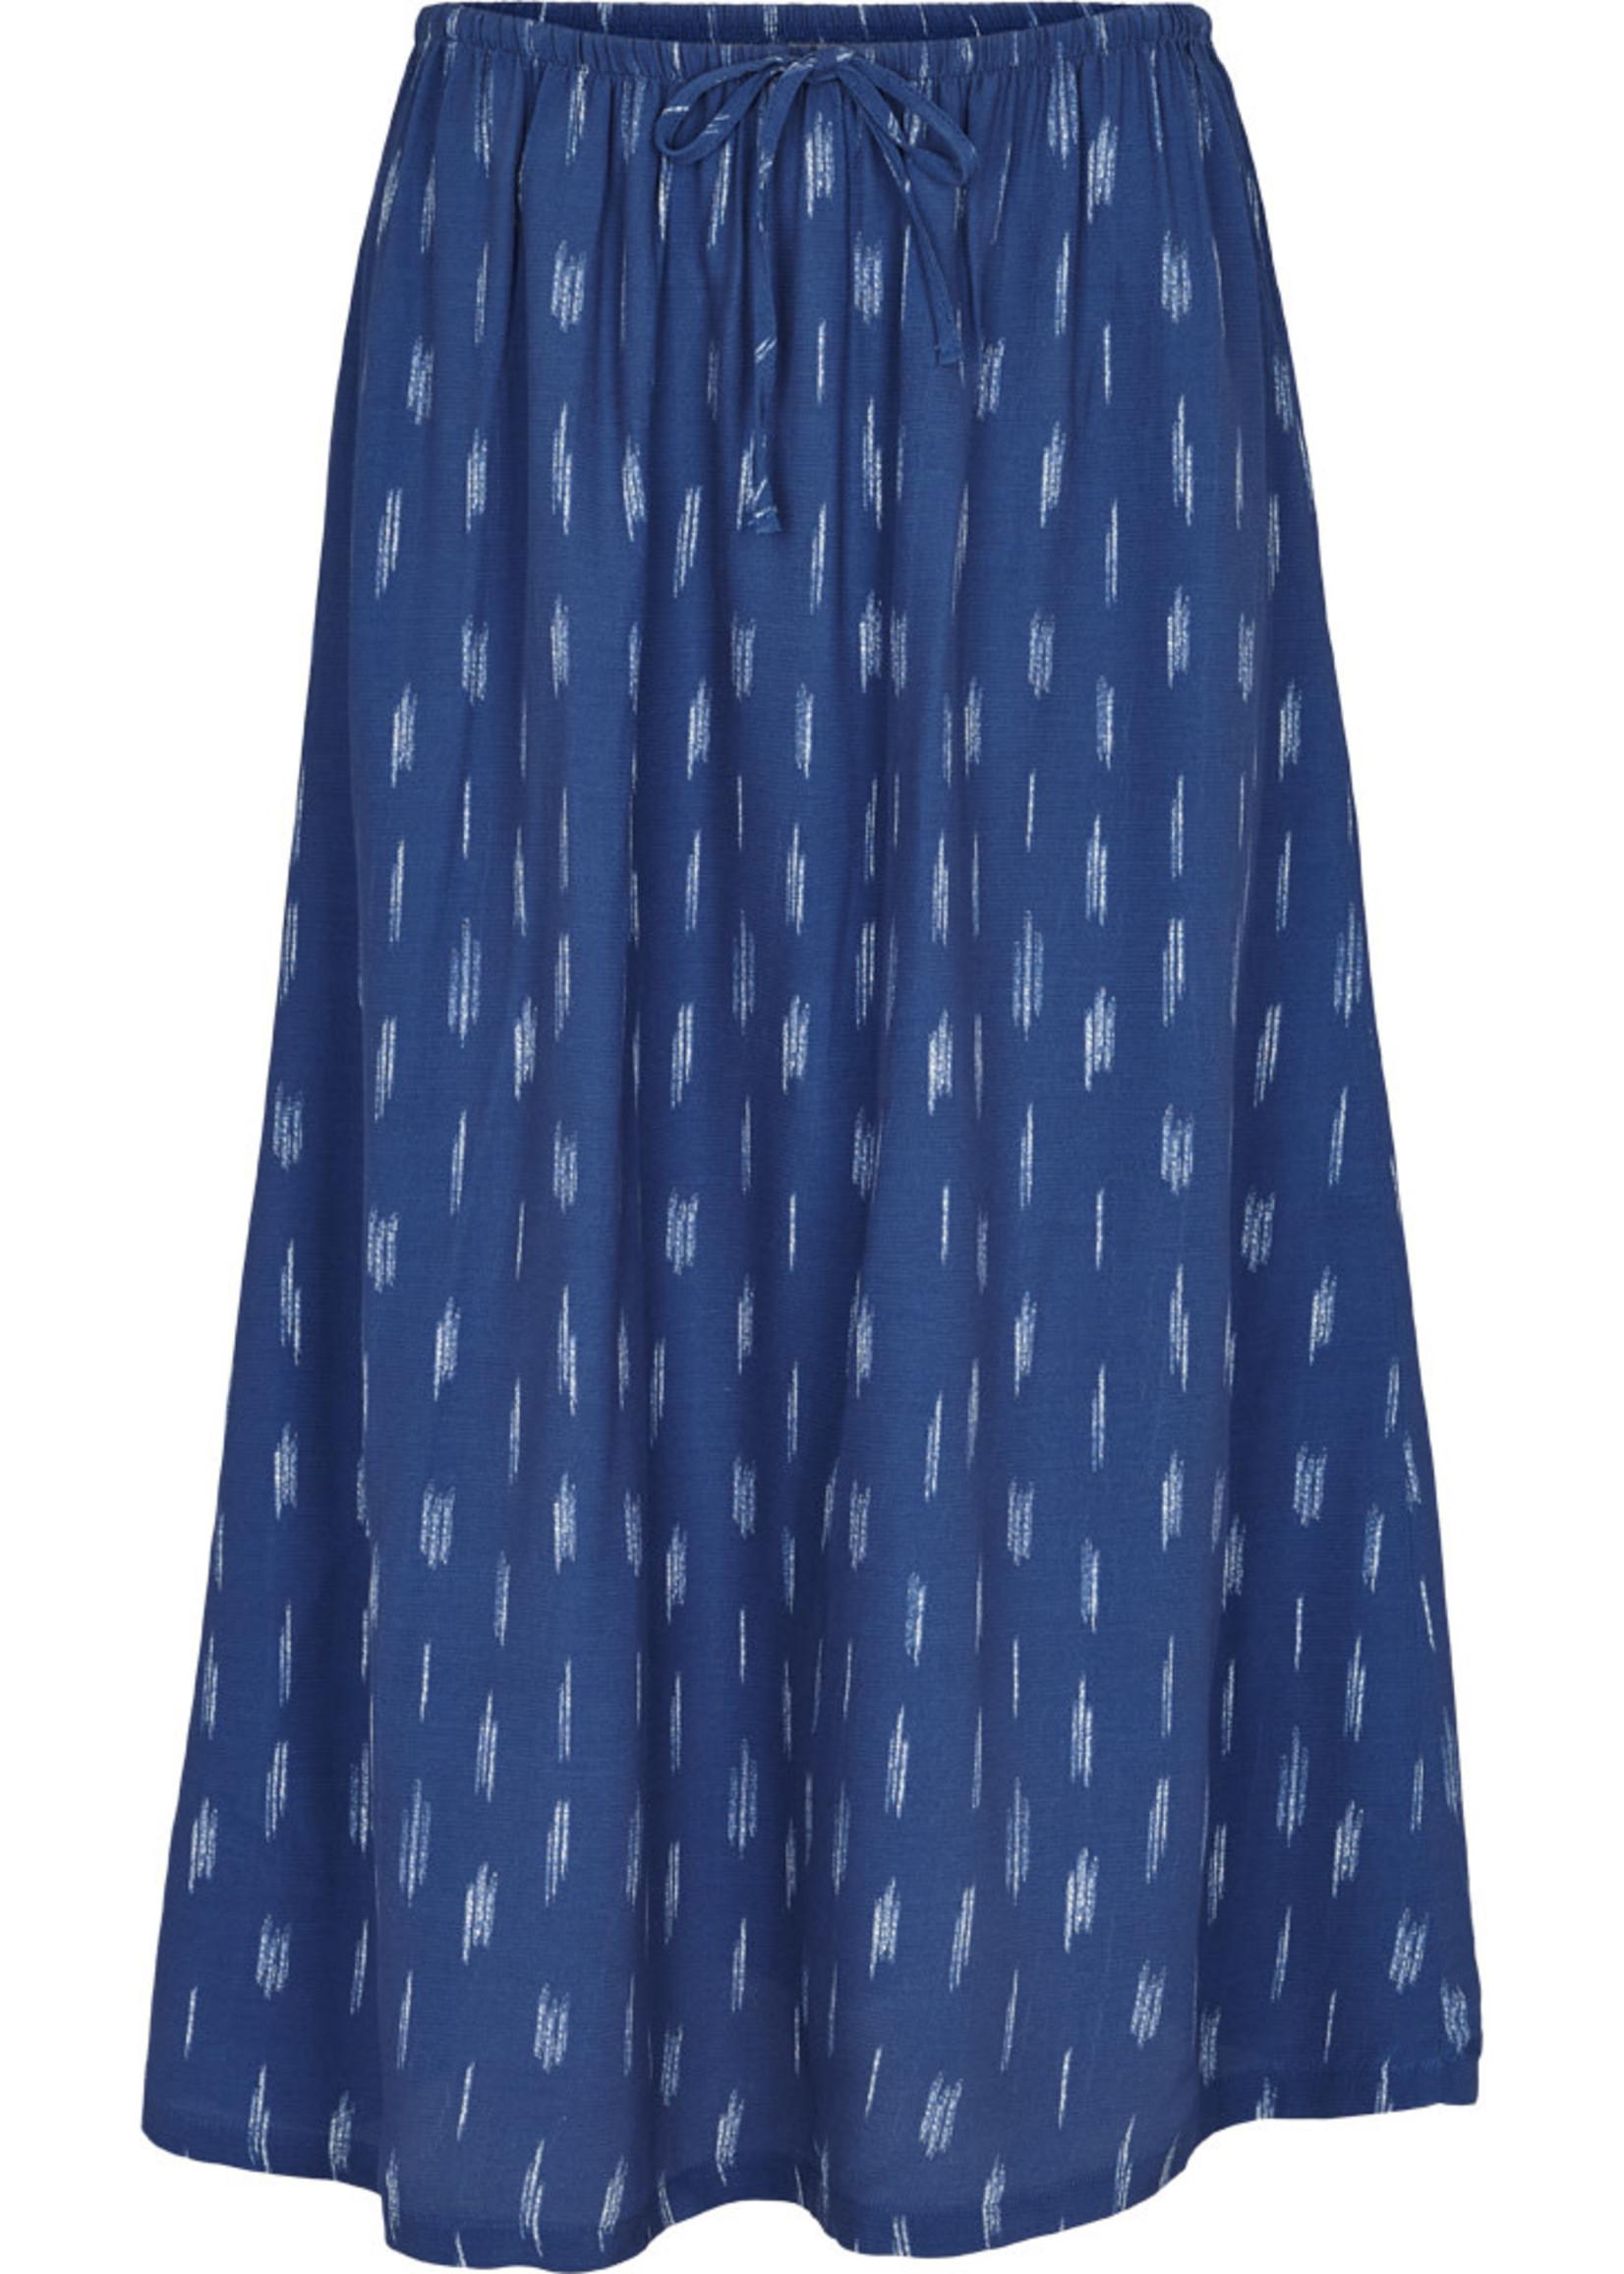 Basic Apparel Fleur Skirt